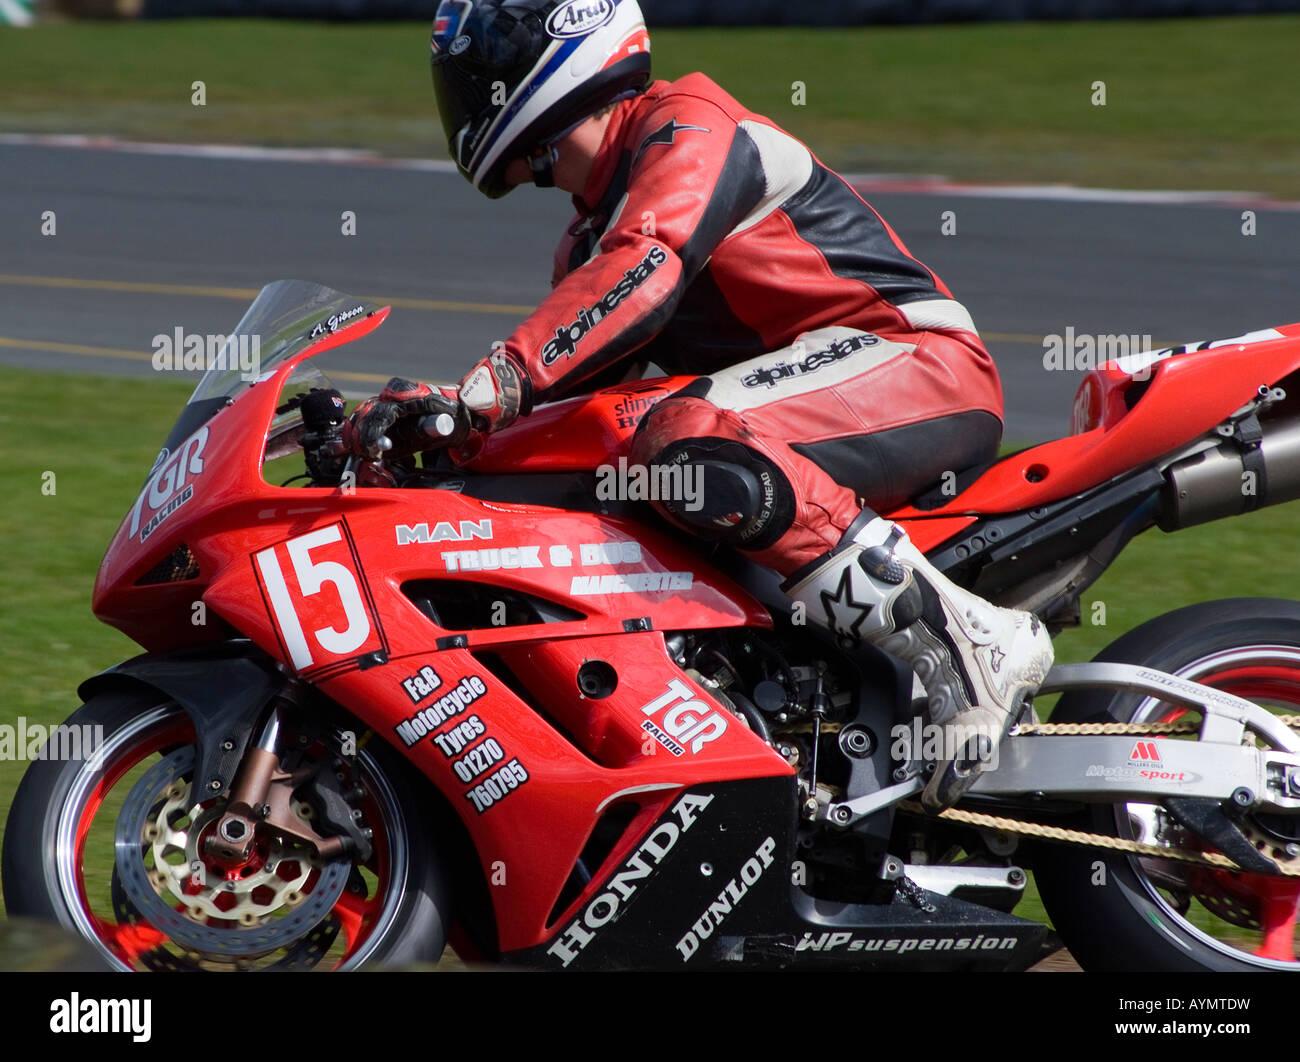 Racing motorbike race track stock photos racing for National motor club compensation plan